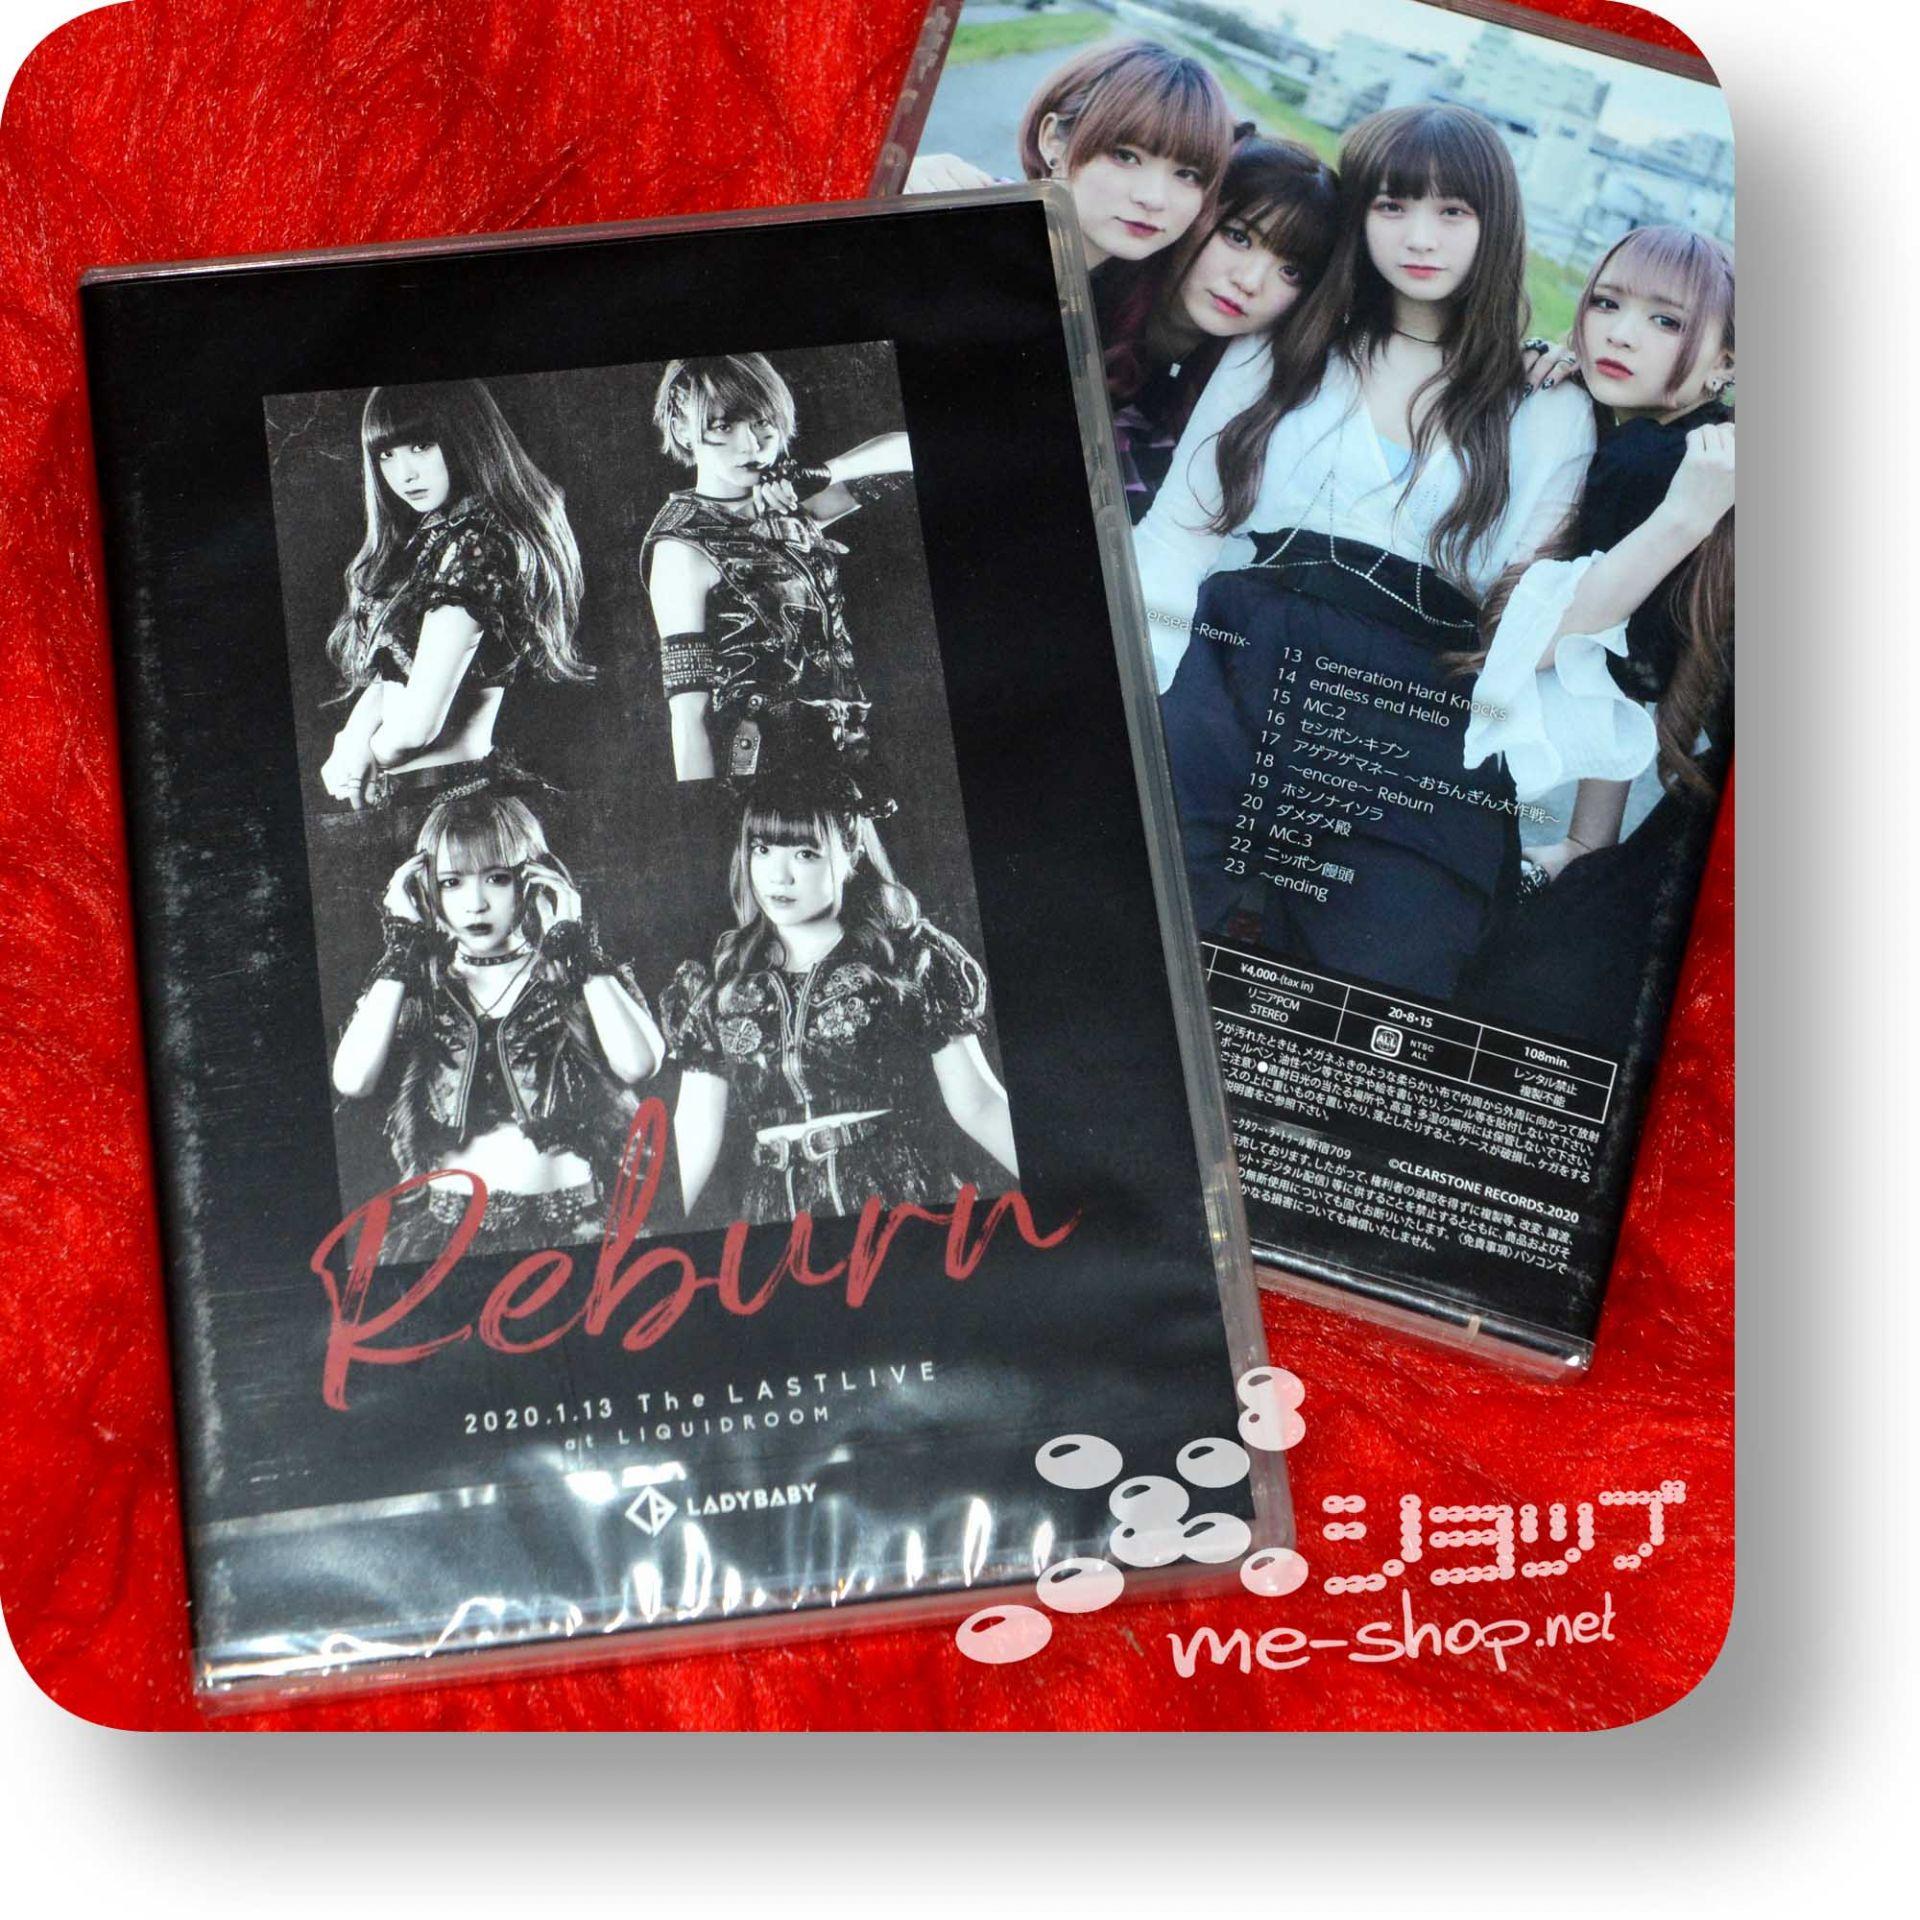 ladybaby reburn dvd